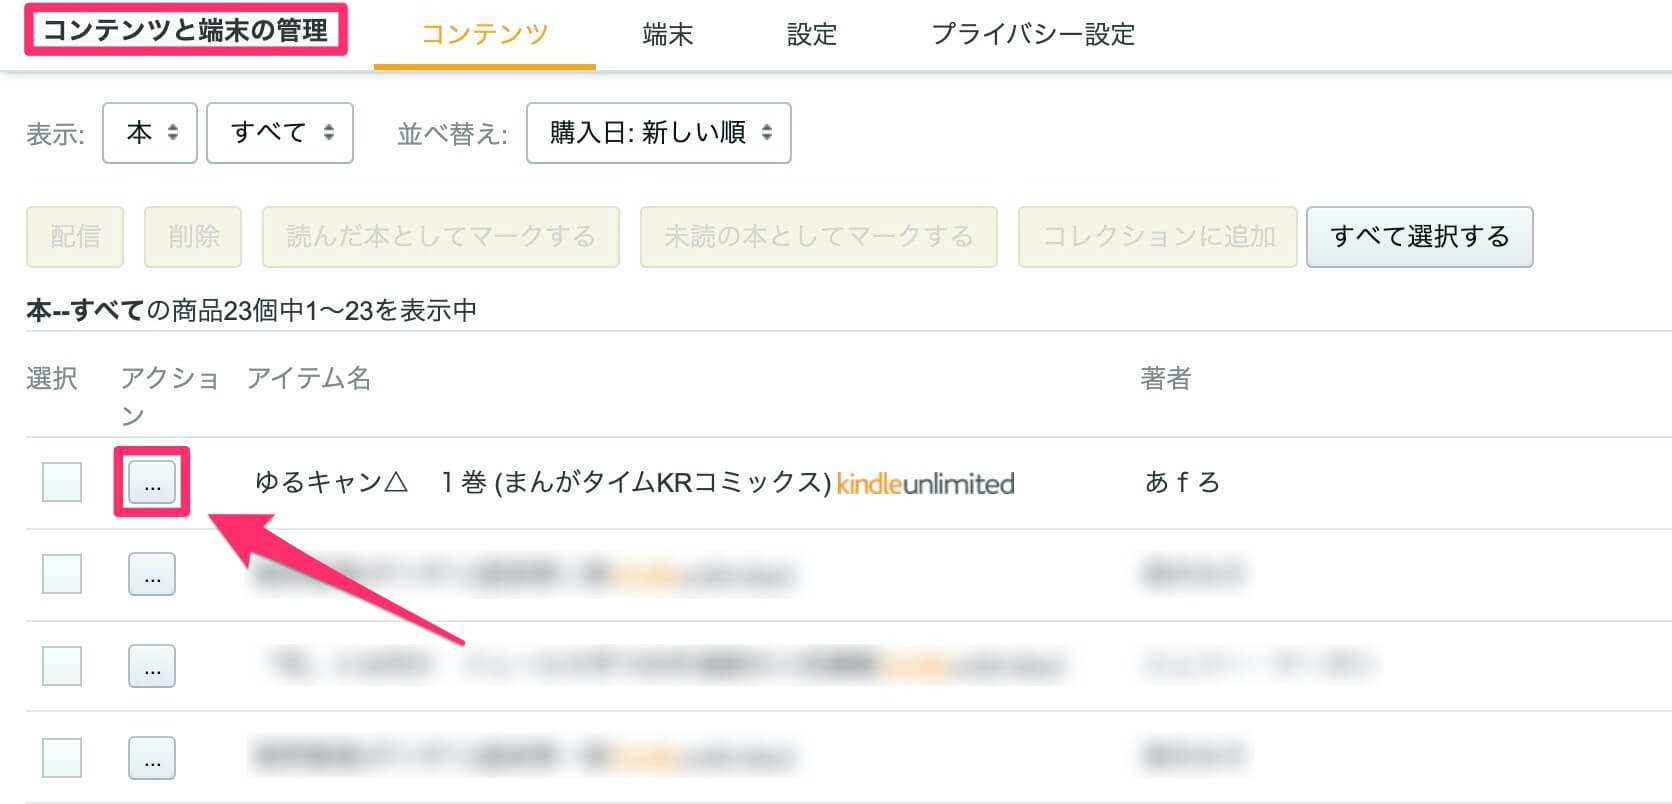 Kindle アンリミテッド:料金・使い方・検索方法